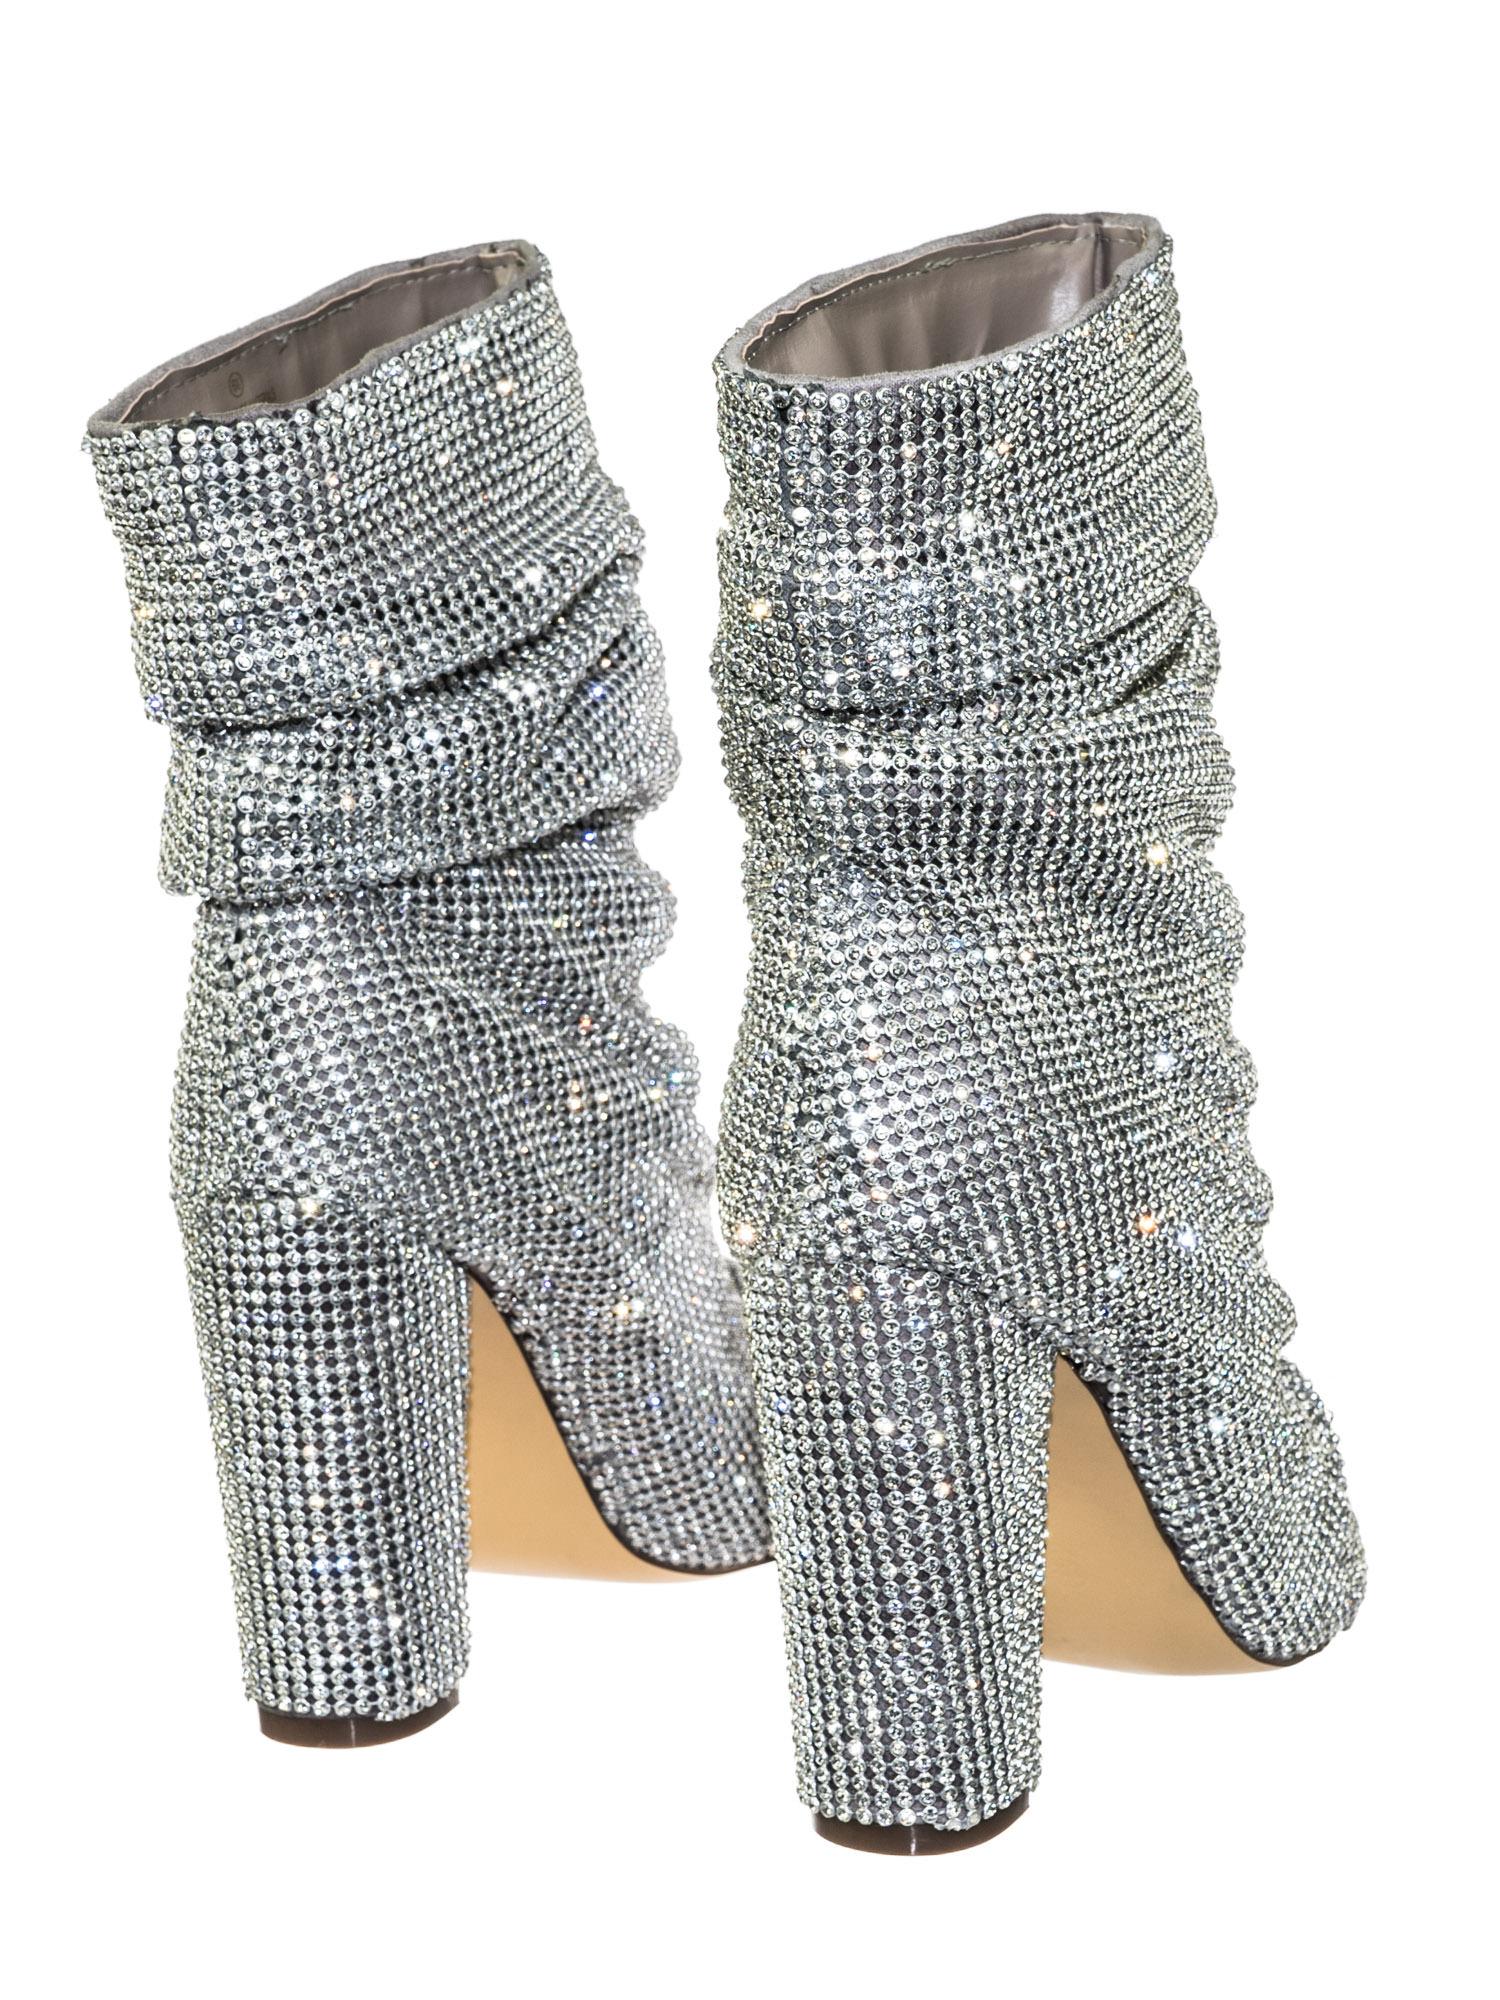 3b9ed05a087 Queen Silver by Liliana Women s Rhinestone Crystal Peep Toe Block Heel High  Ankle Slouch Bootie 2